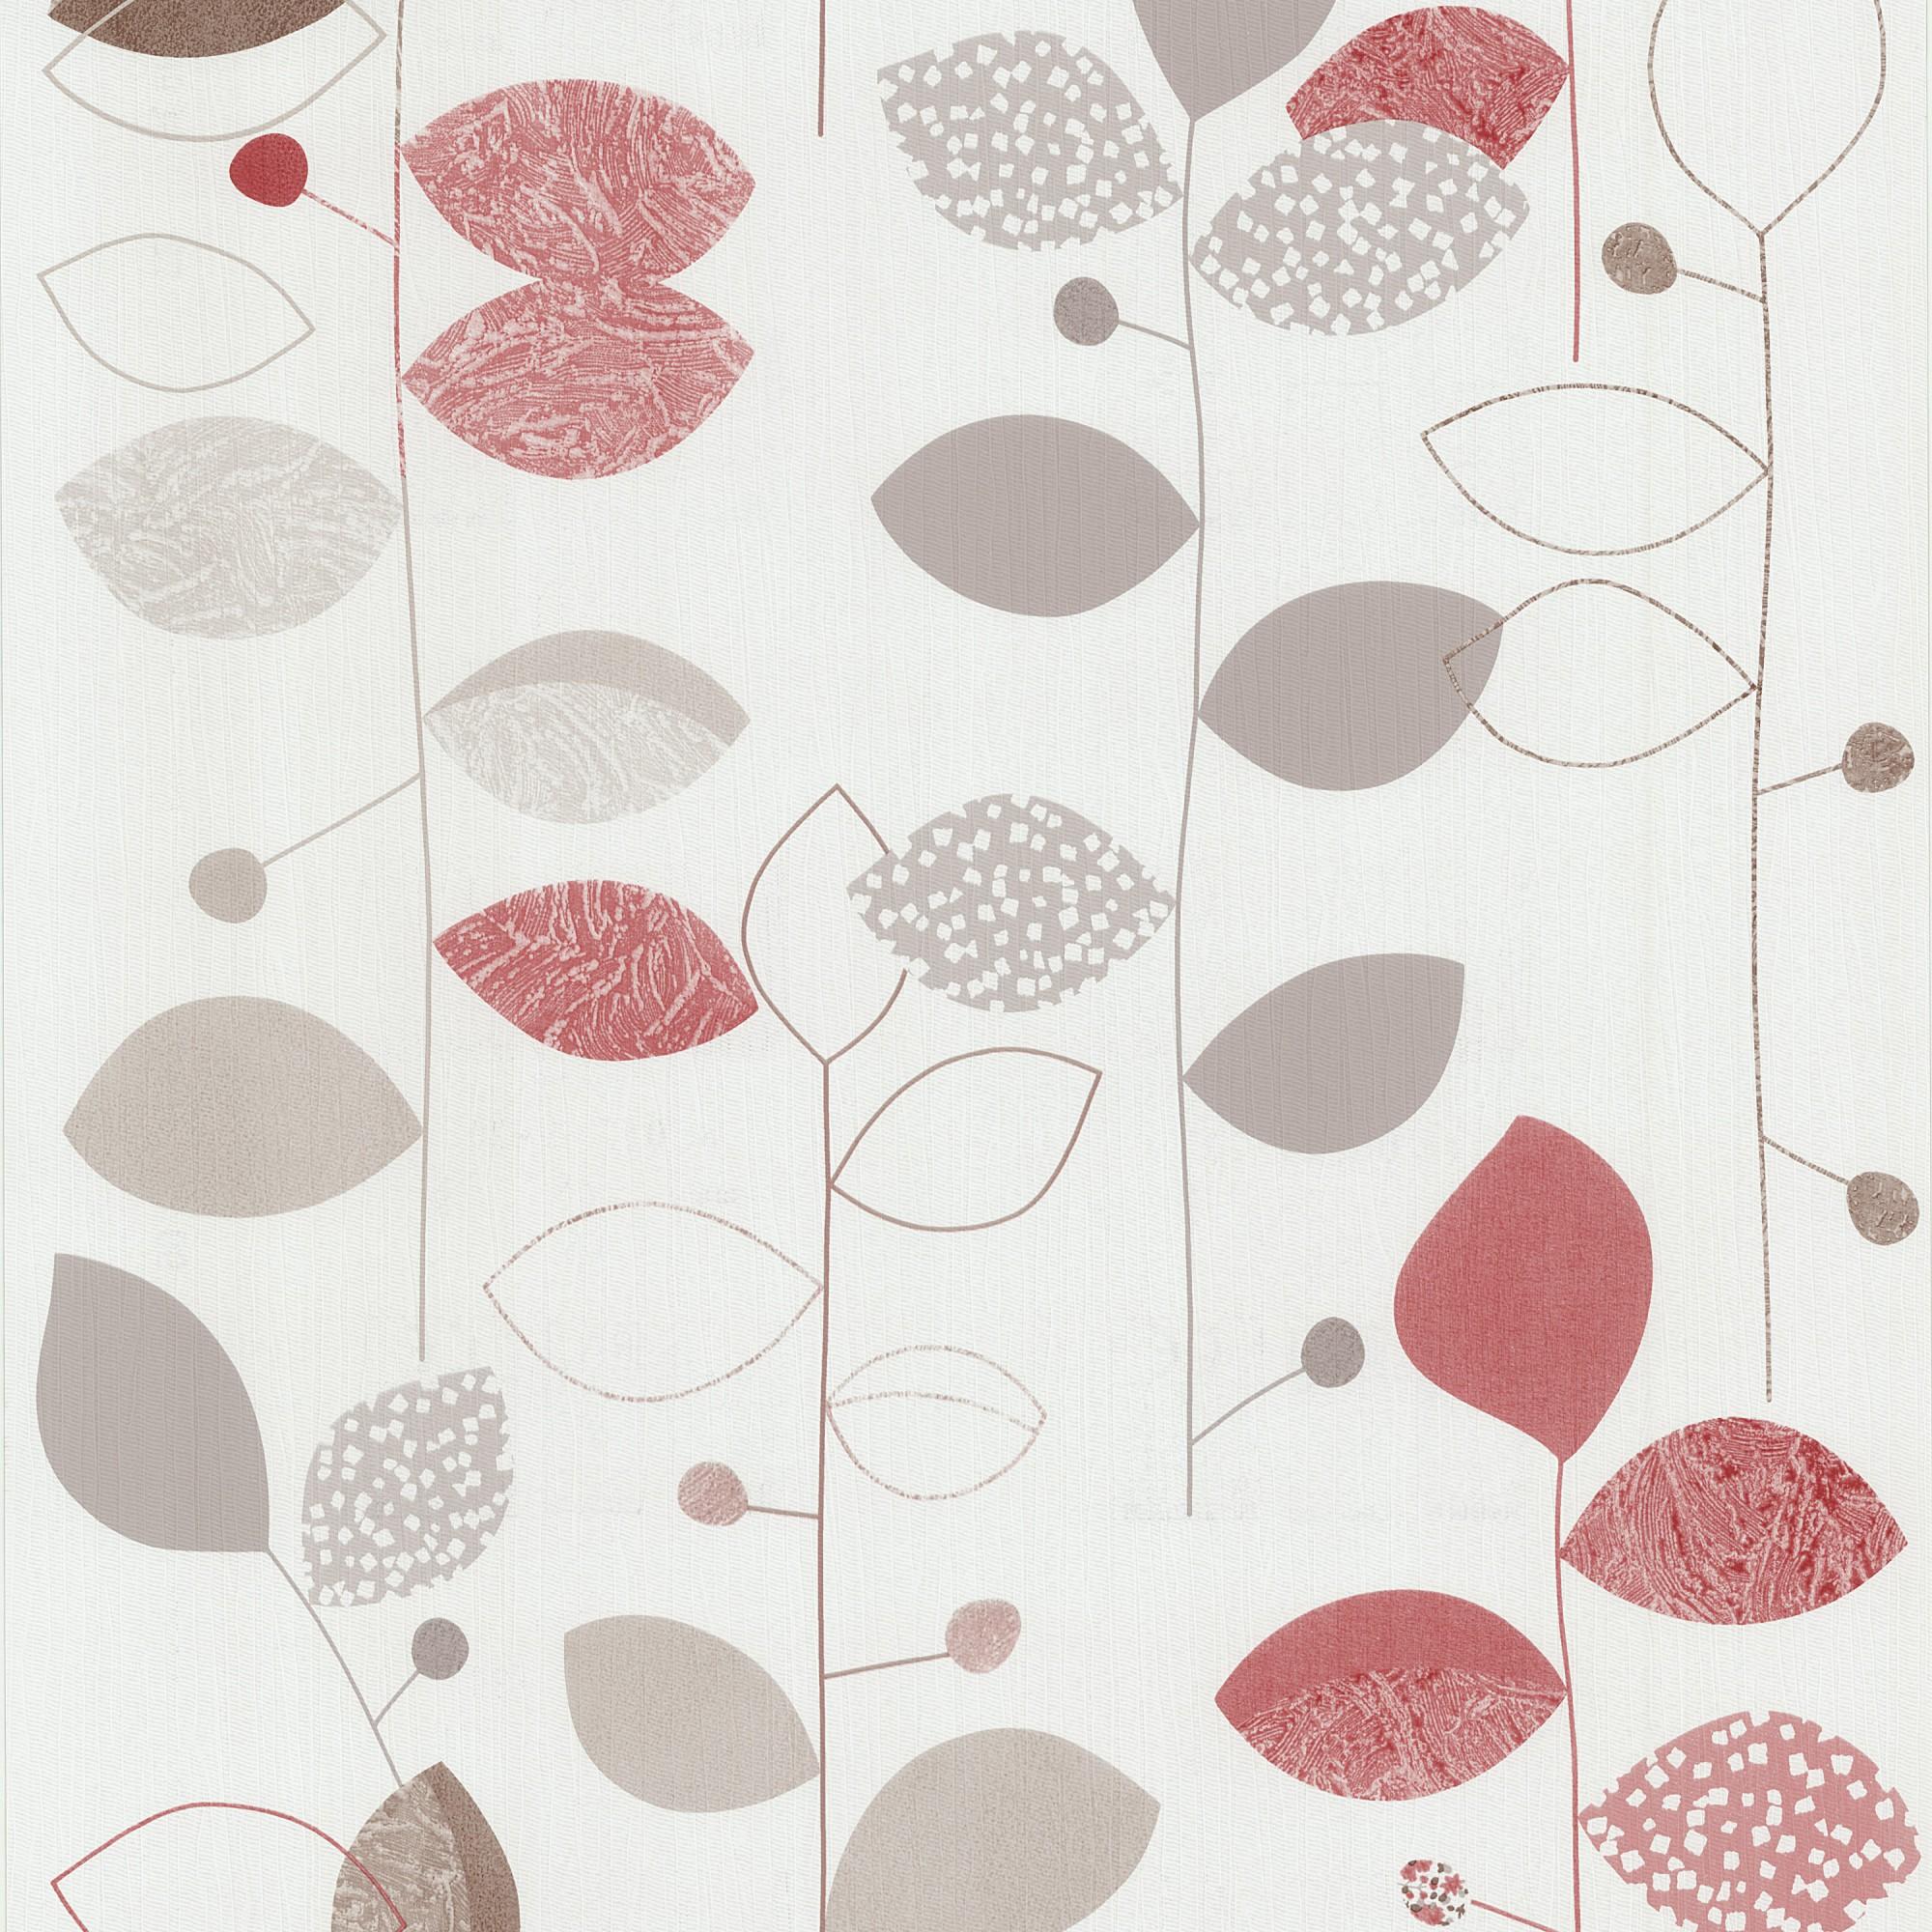 tapeten floral rot braun tapete p s international x treme color 05561 30. Black Bedroom Furniture Sets. Home Design Ideas